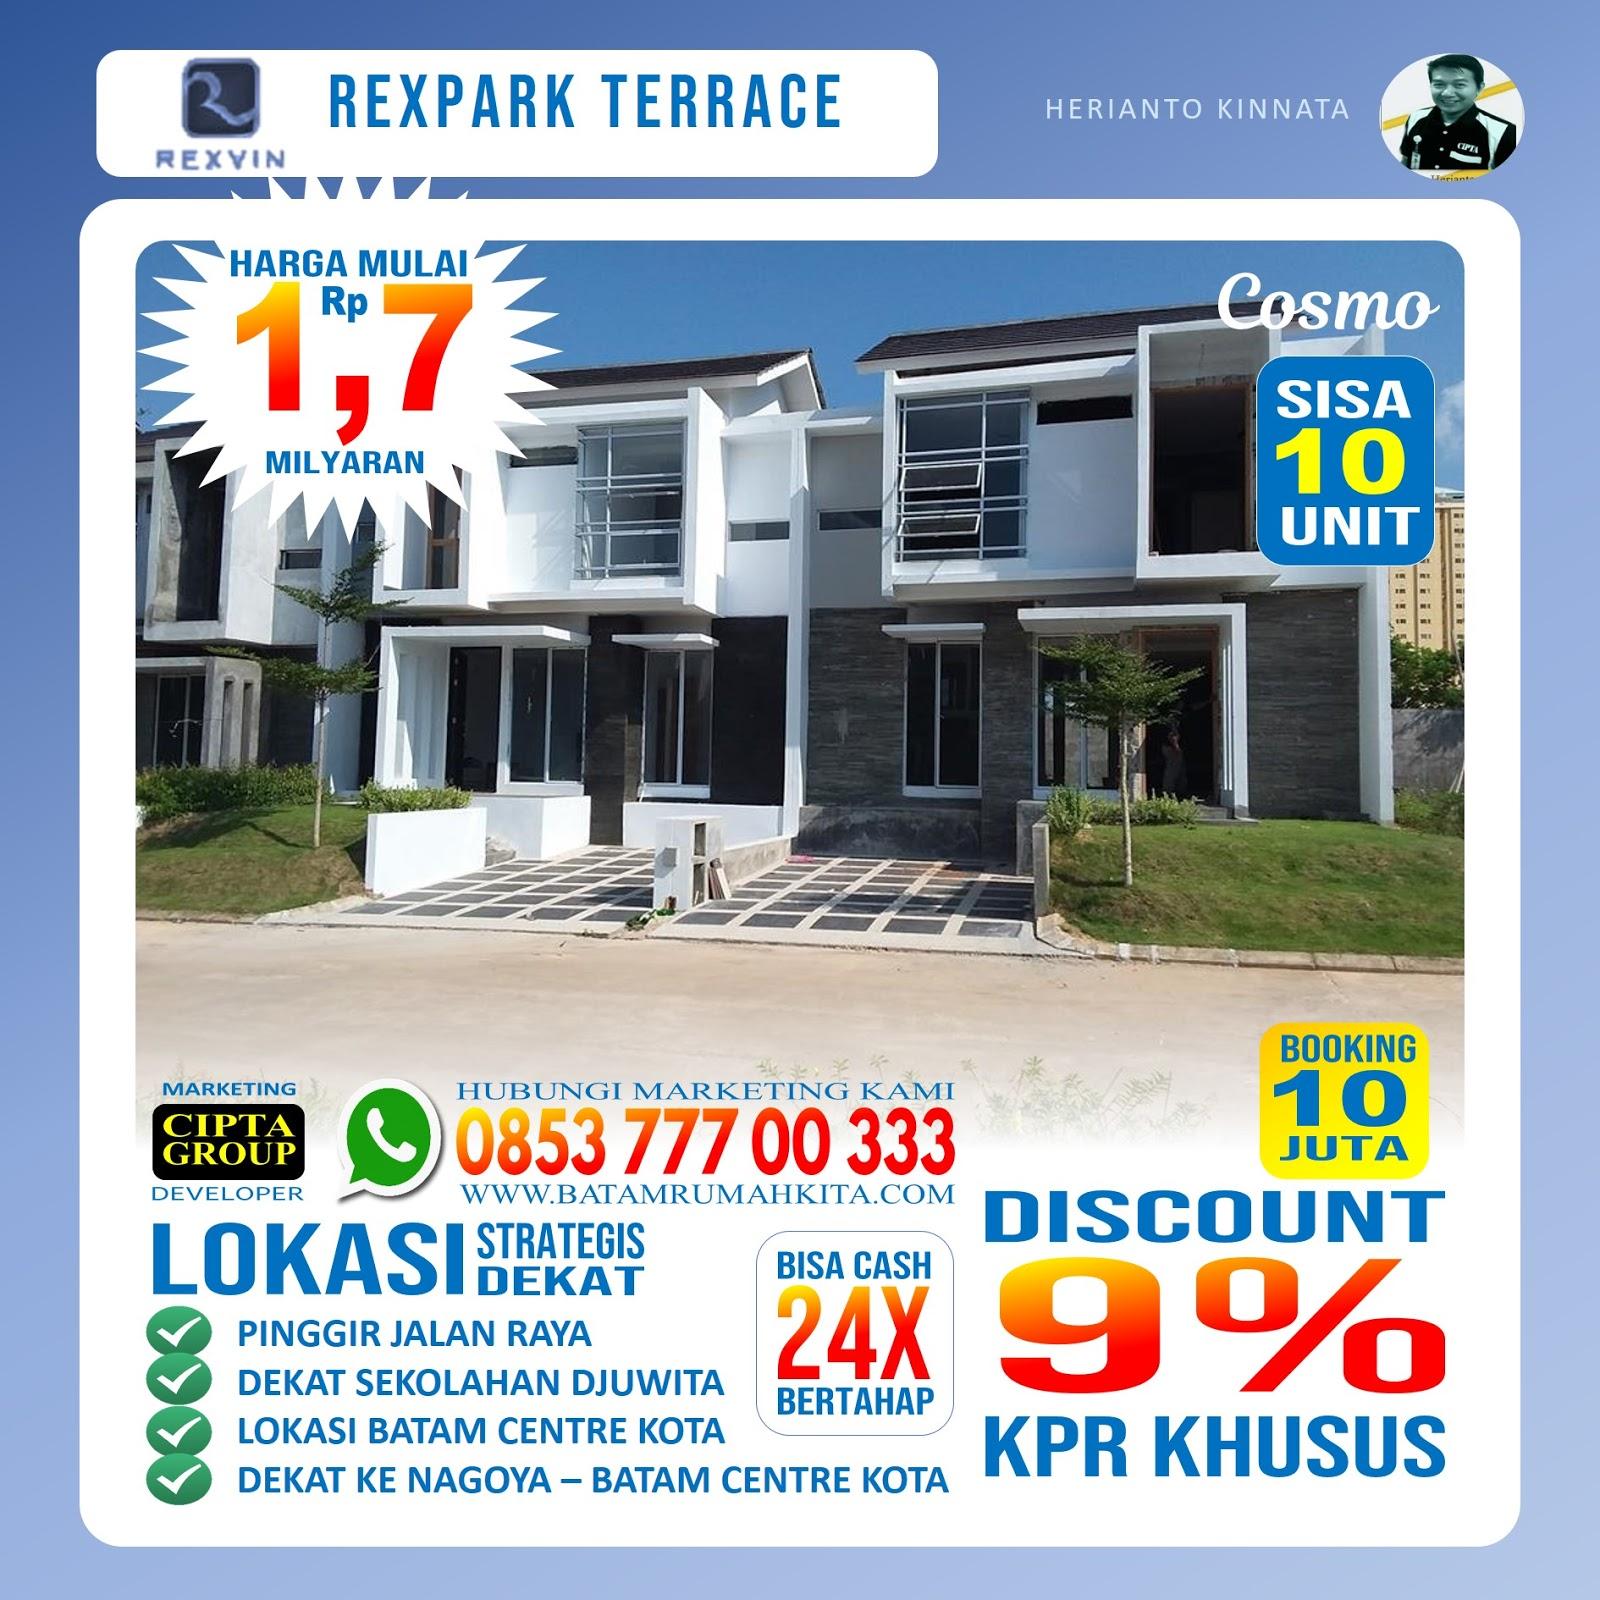 Perumahan Rexpark Terrace - Type cosmo -1